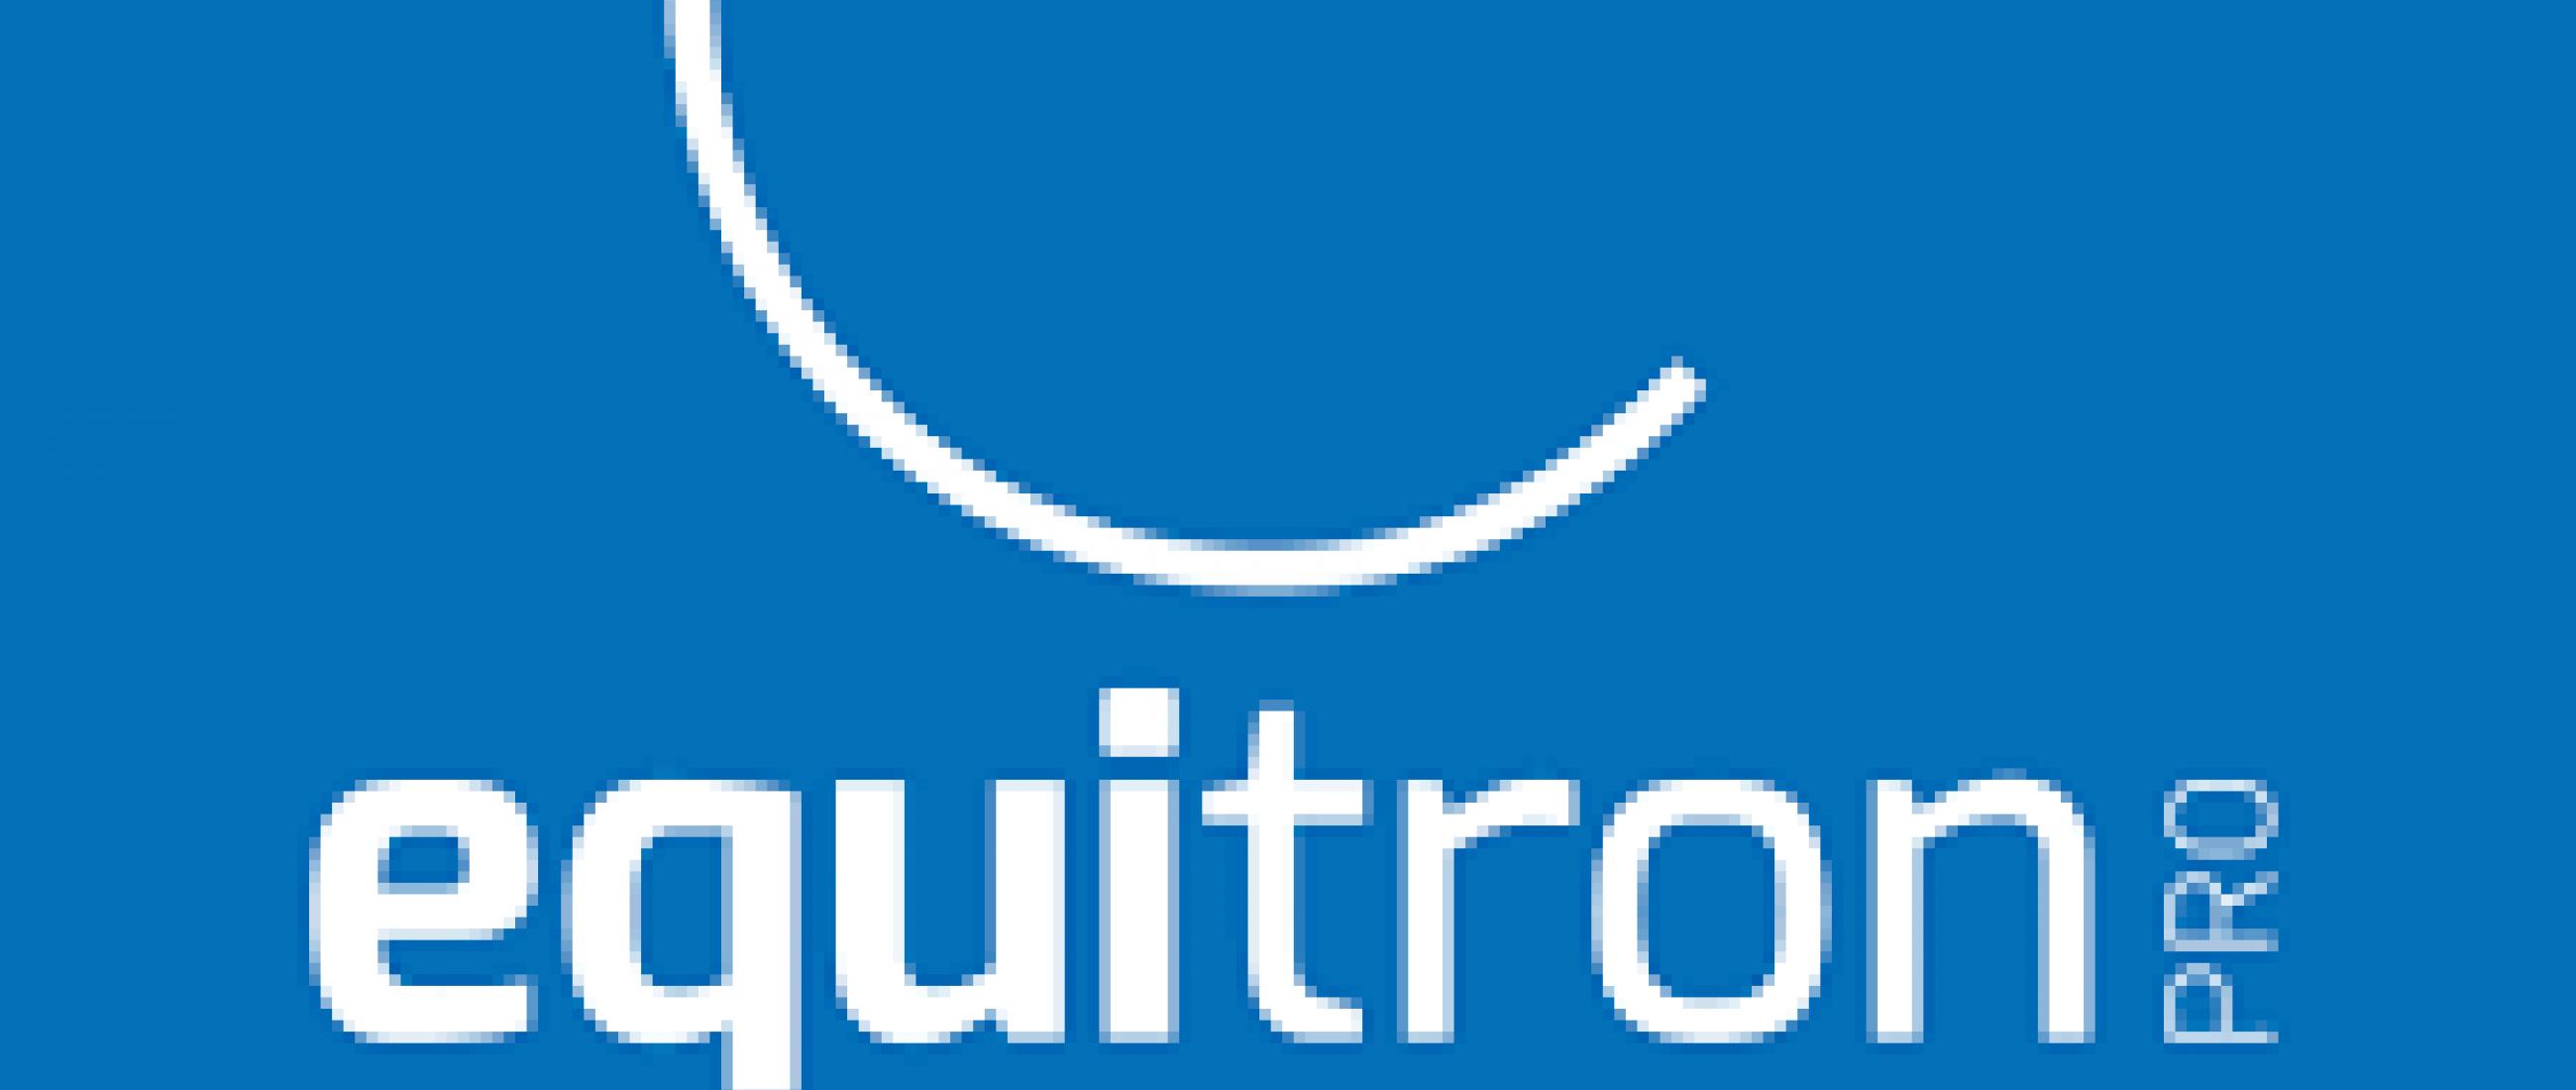 V-sporthorses is behandelingspartner en distributor van Equitron-pro!